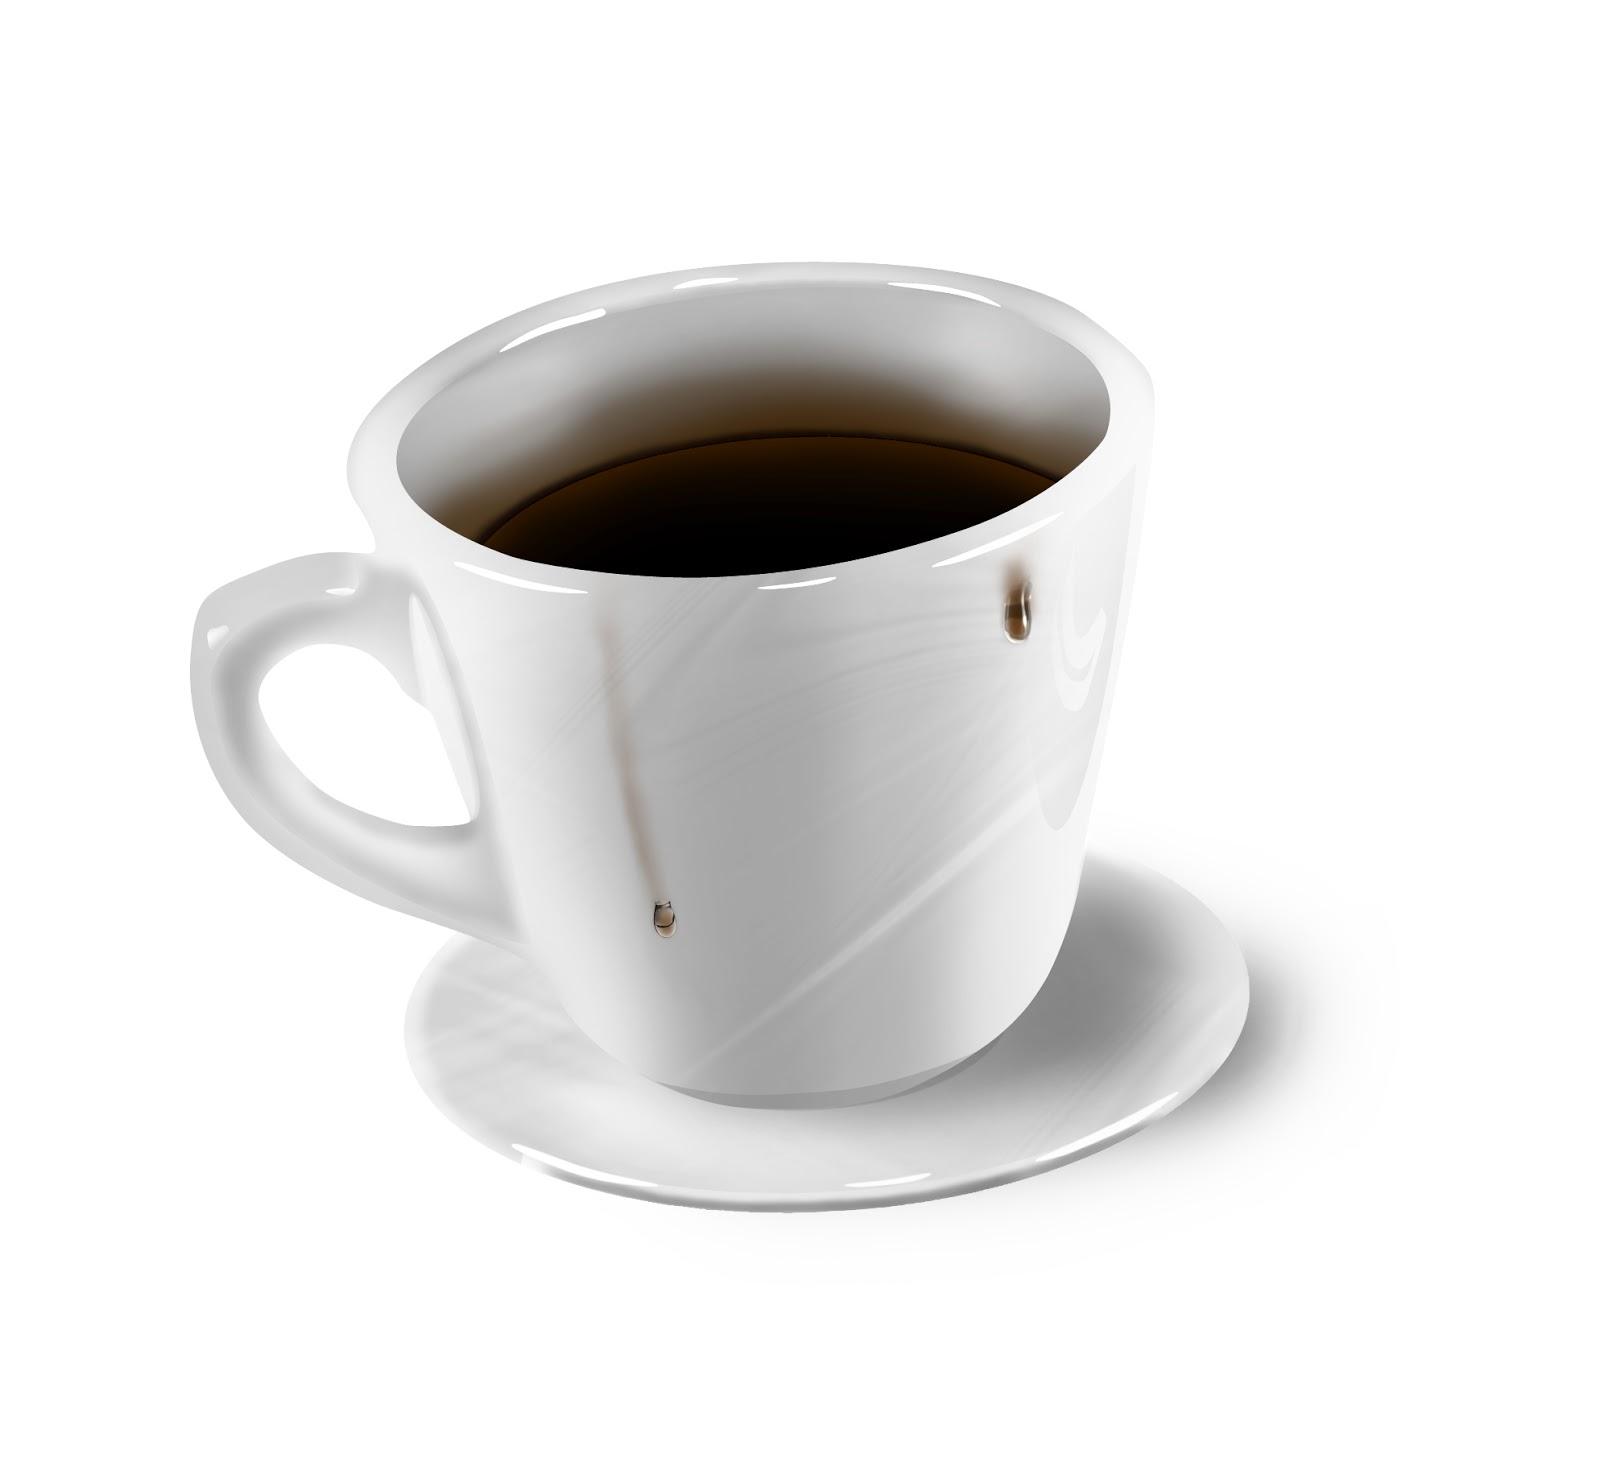 IMAGENSNET: PAPEL DE PAREDE XÍCARA DE CAFÉ - WALLPAPER CUP